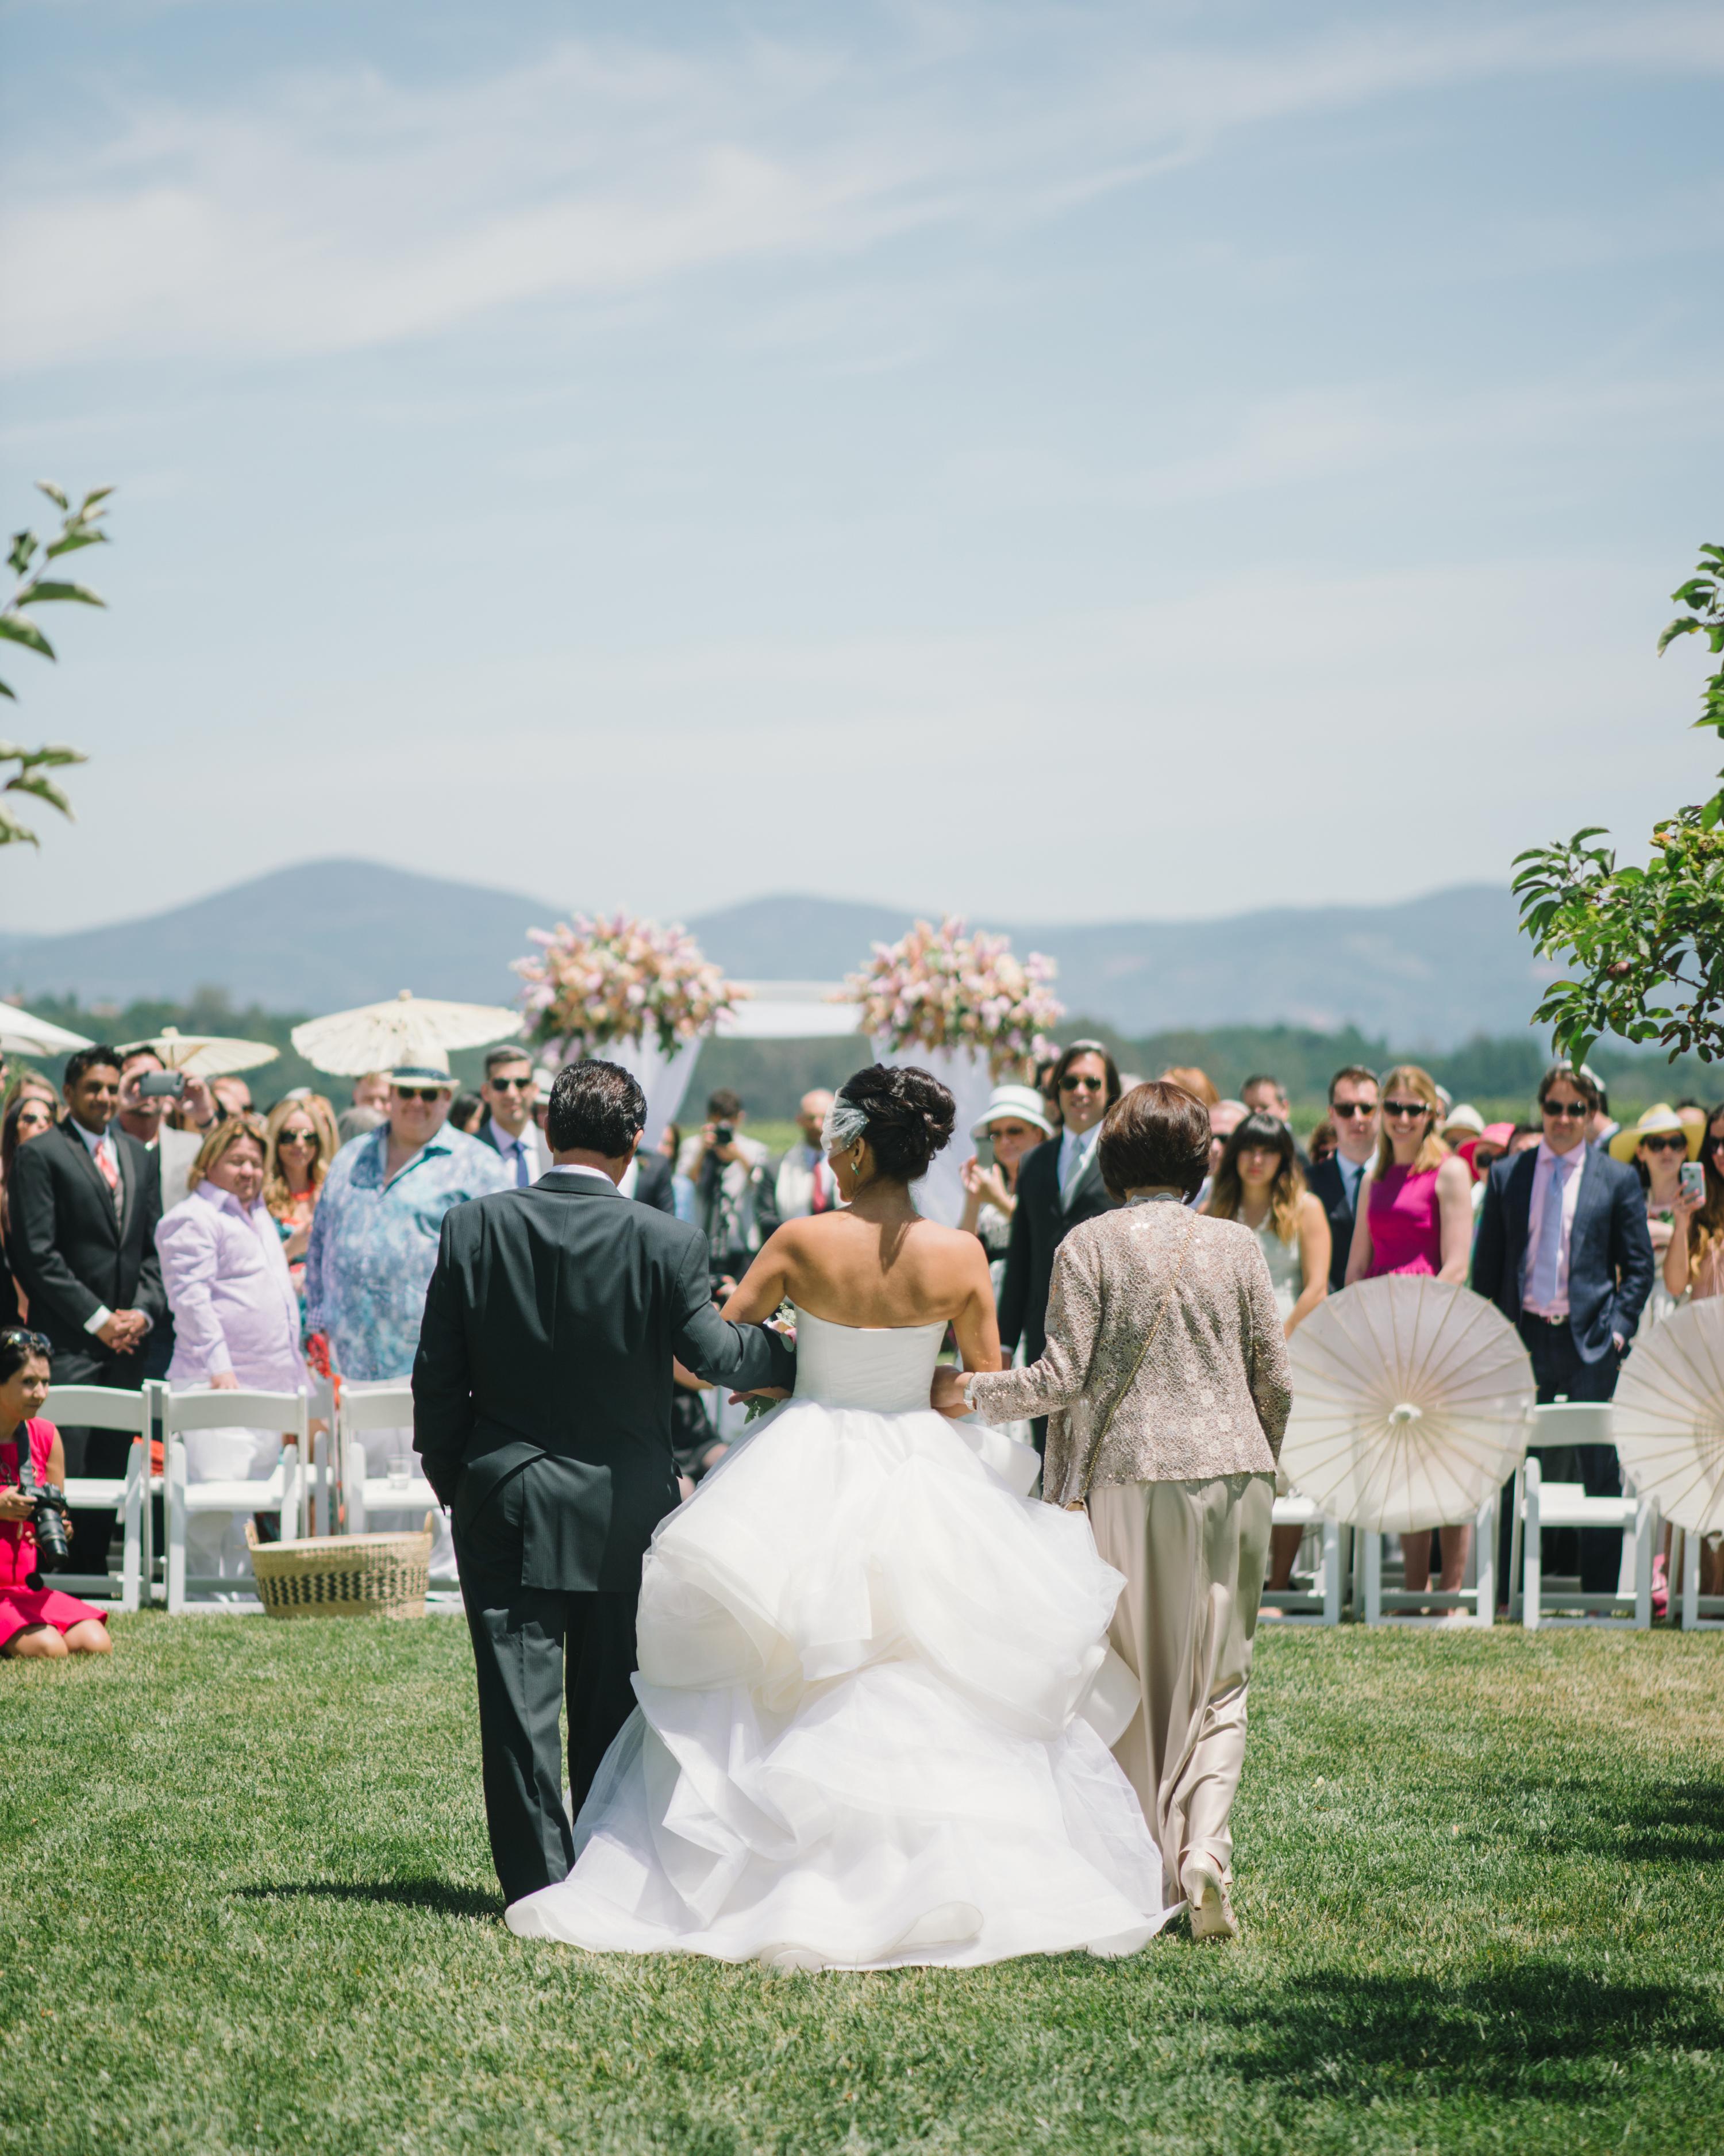 vanessa-joe-wedding-processional-7754-s111736-1214.jpg